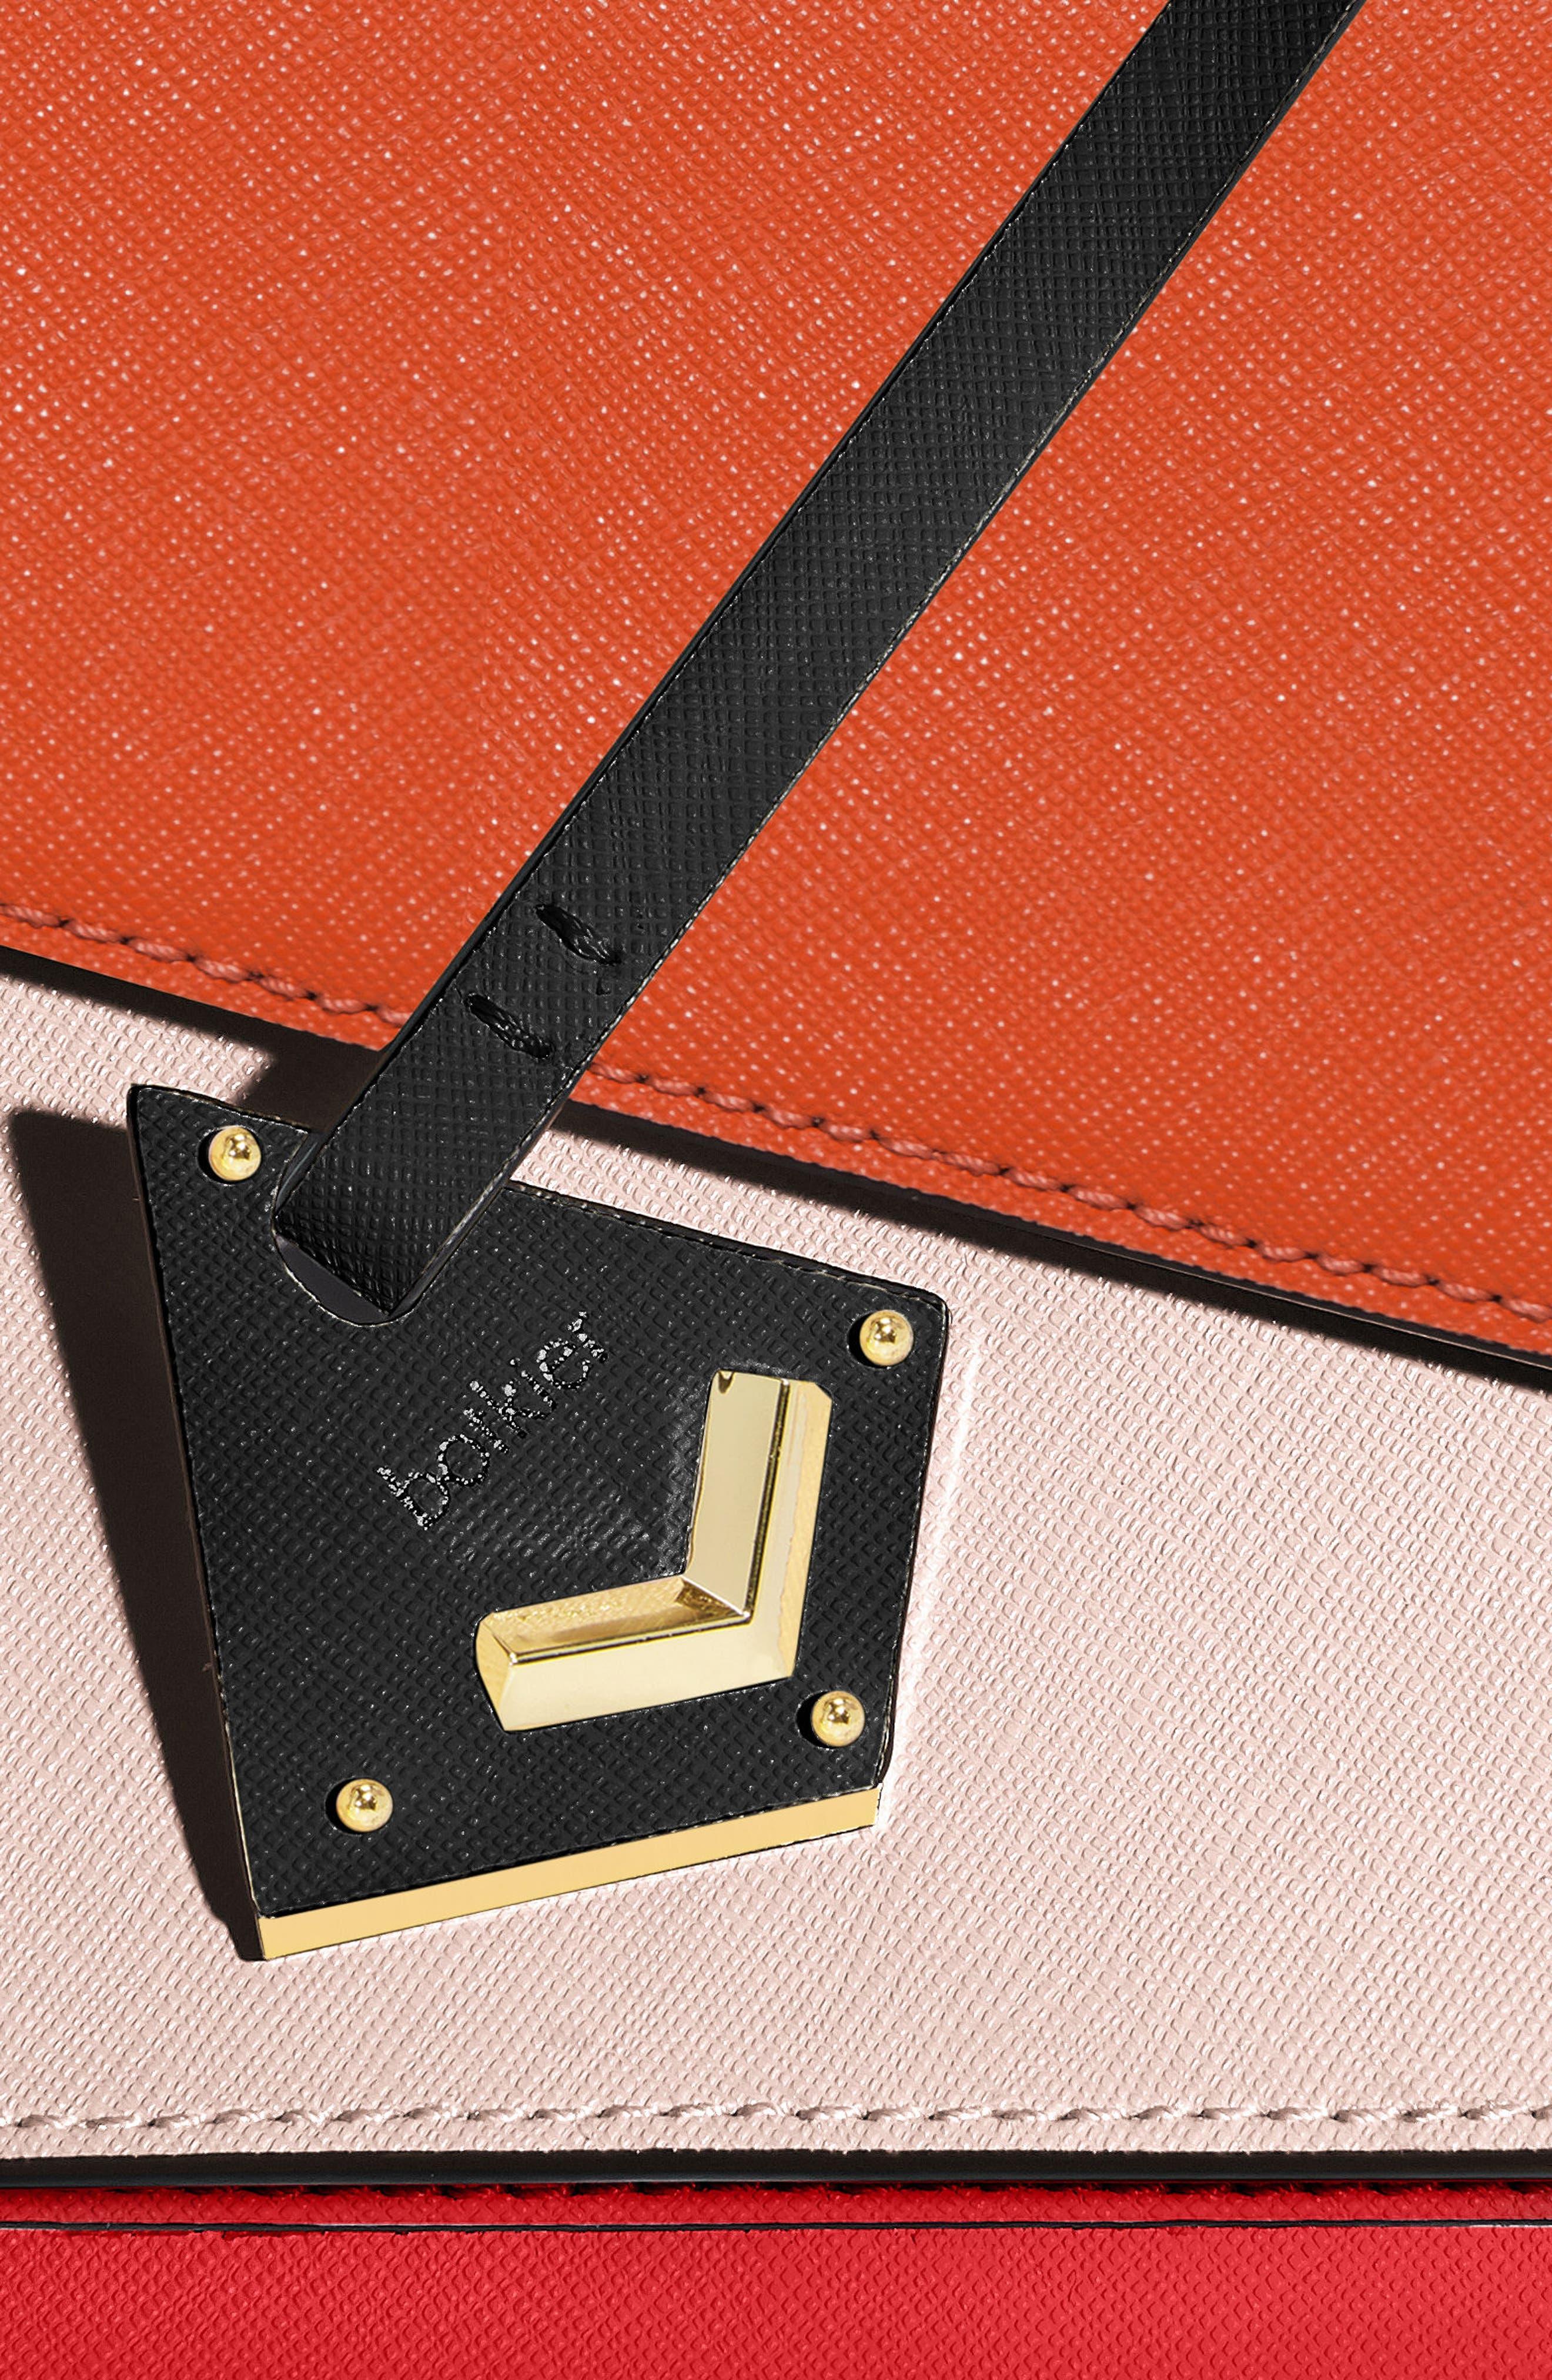 Cobble Hill Leather Crossbody Bag,                             Alternate thumbnail 109, color,